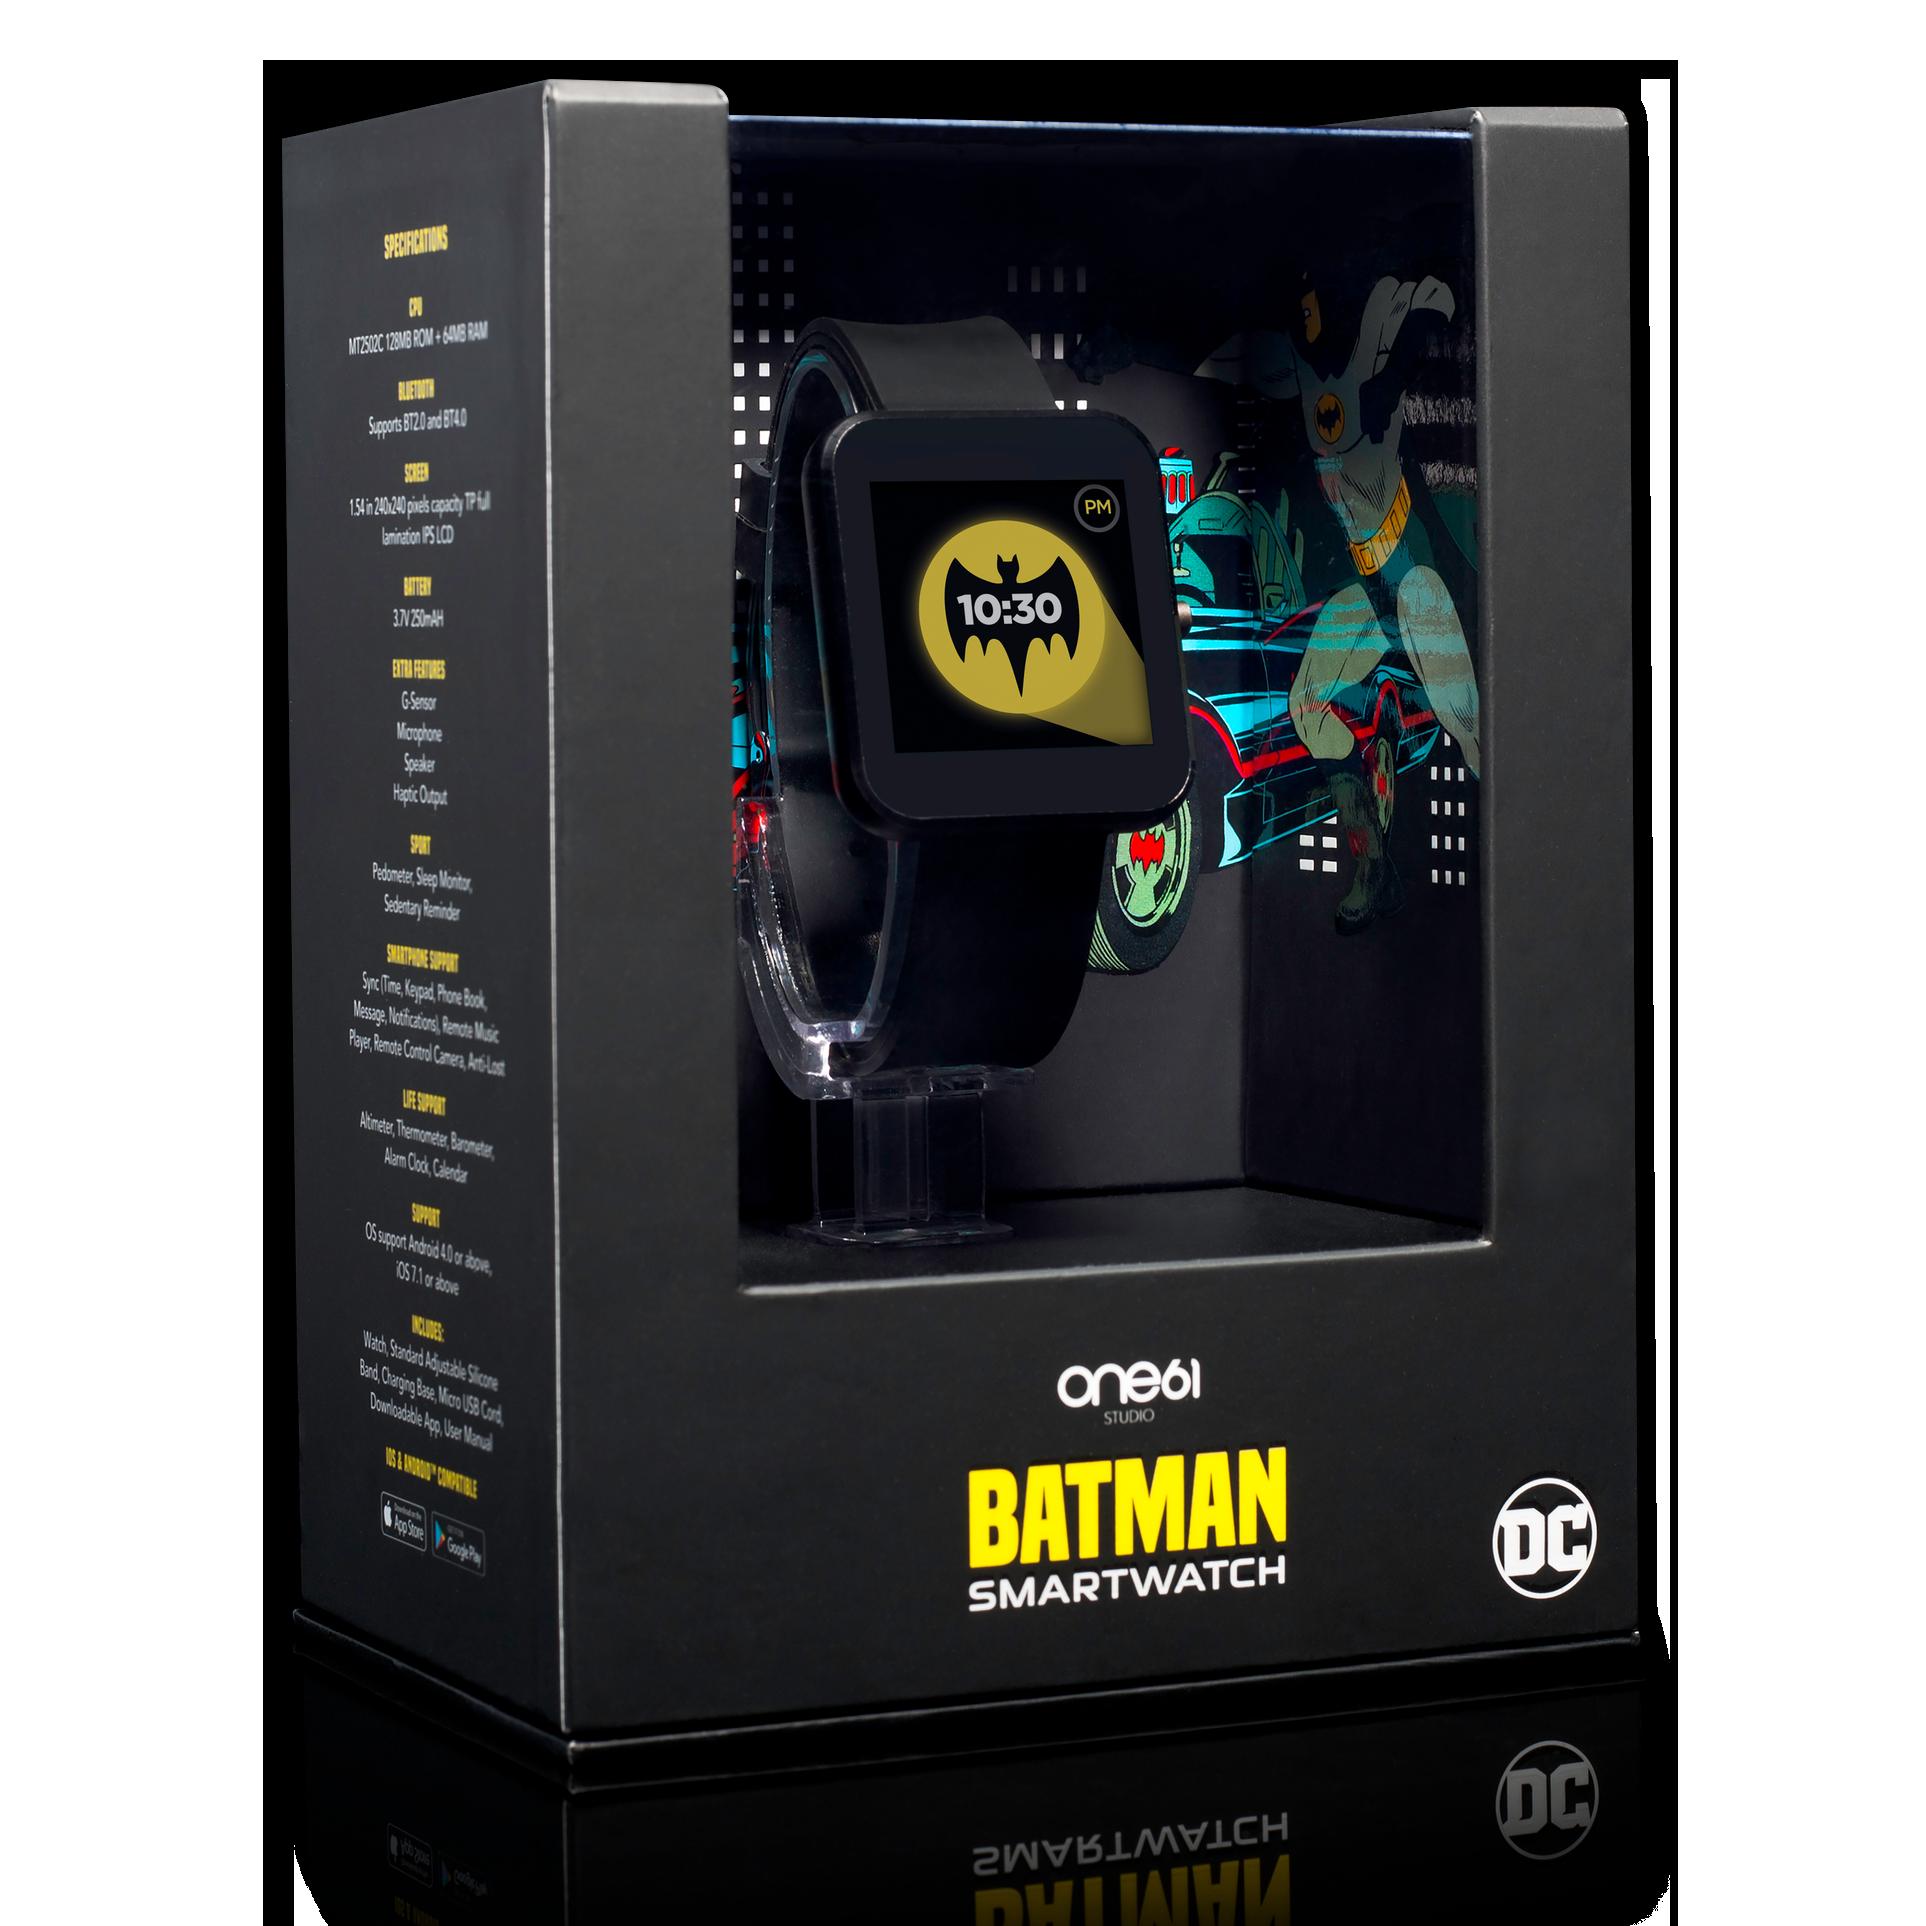 The Batman Smartwatch — One61 | Facetime | Smart watch